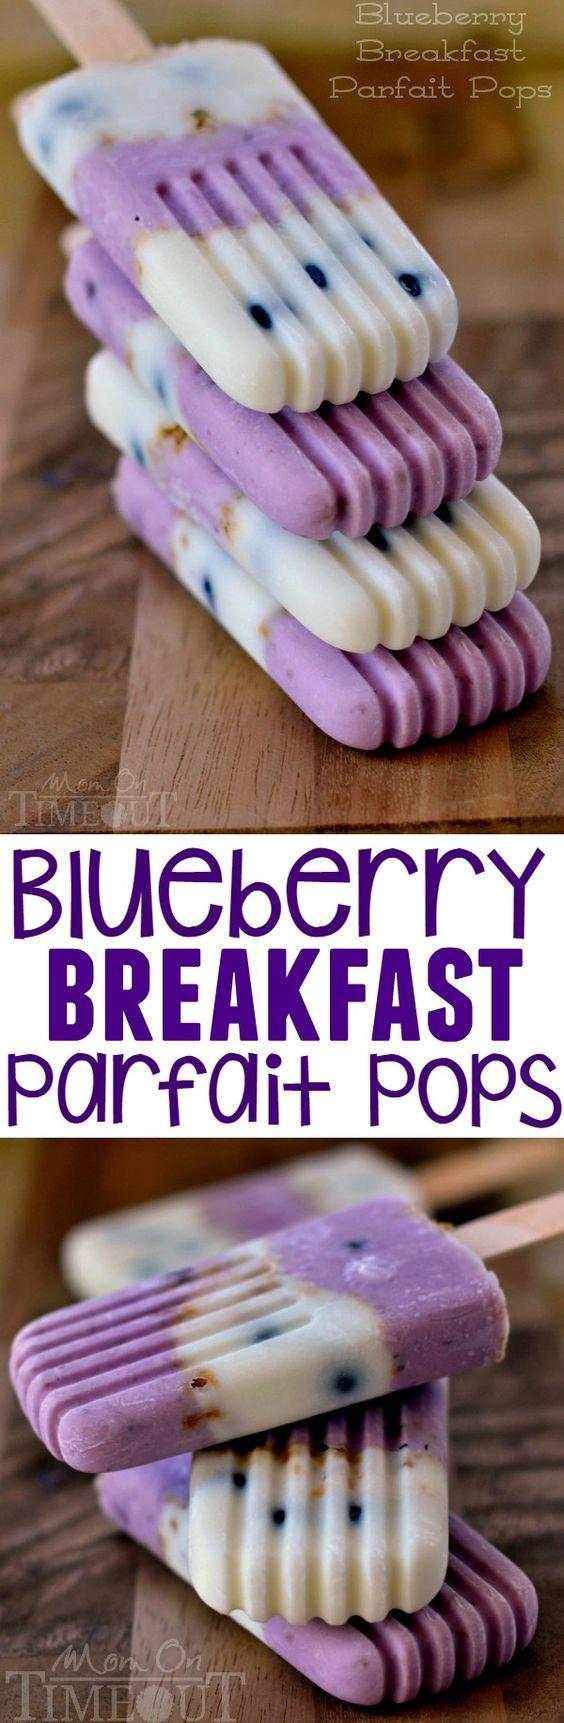 spray frozen blueberry pops recipes dishmaps frozen blueberry pops ...